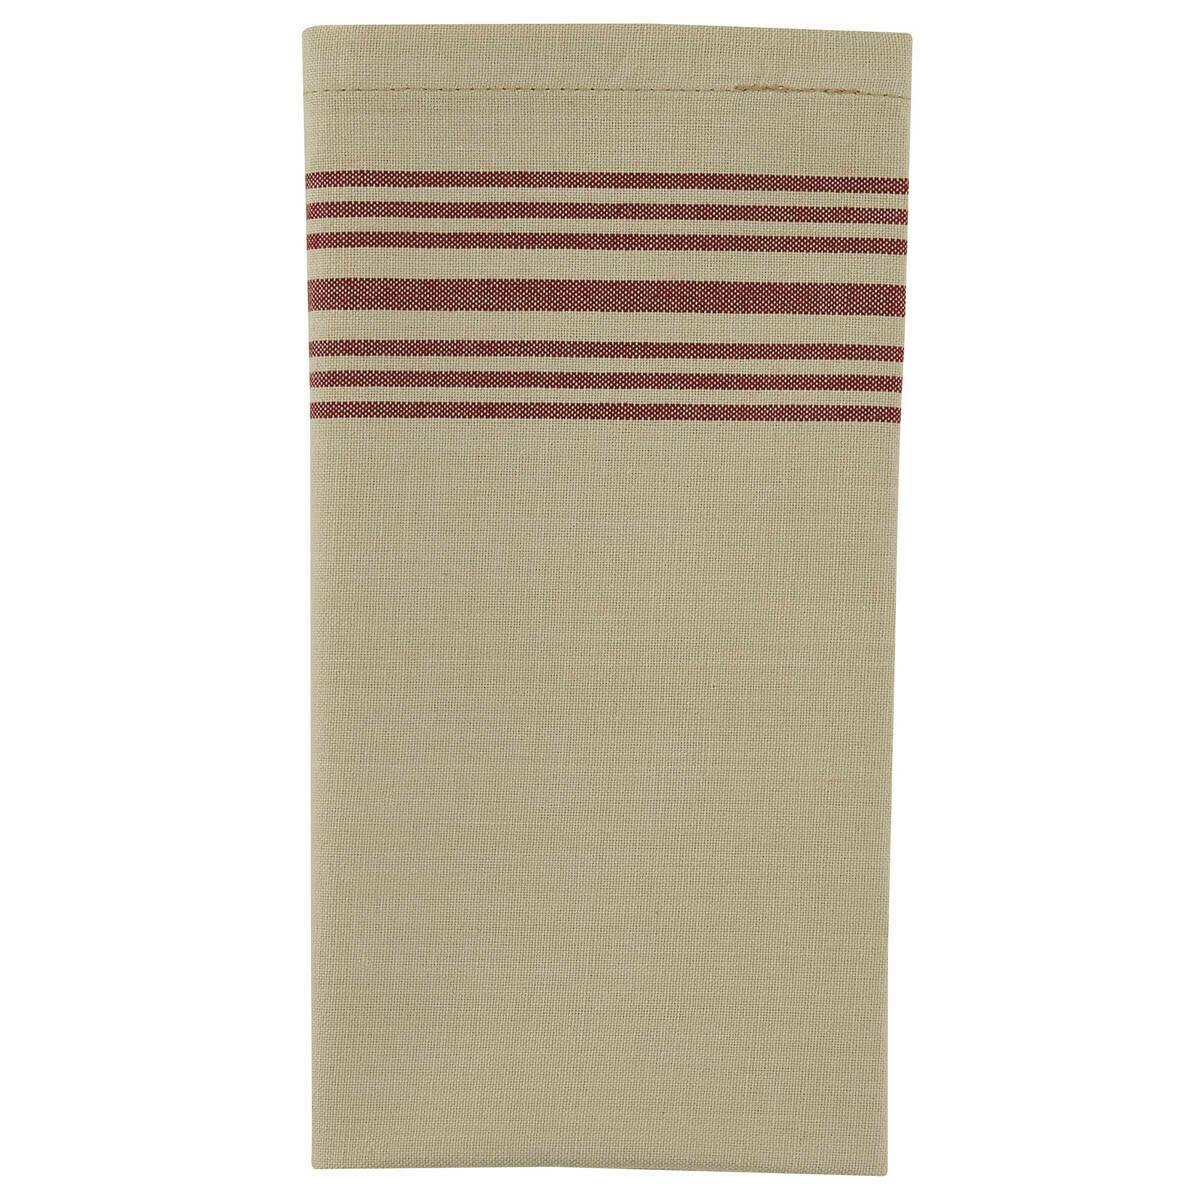 Rustic Stripe Napkin